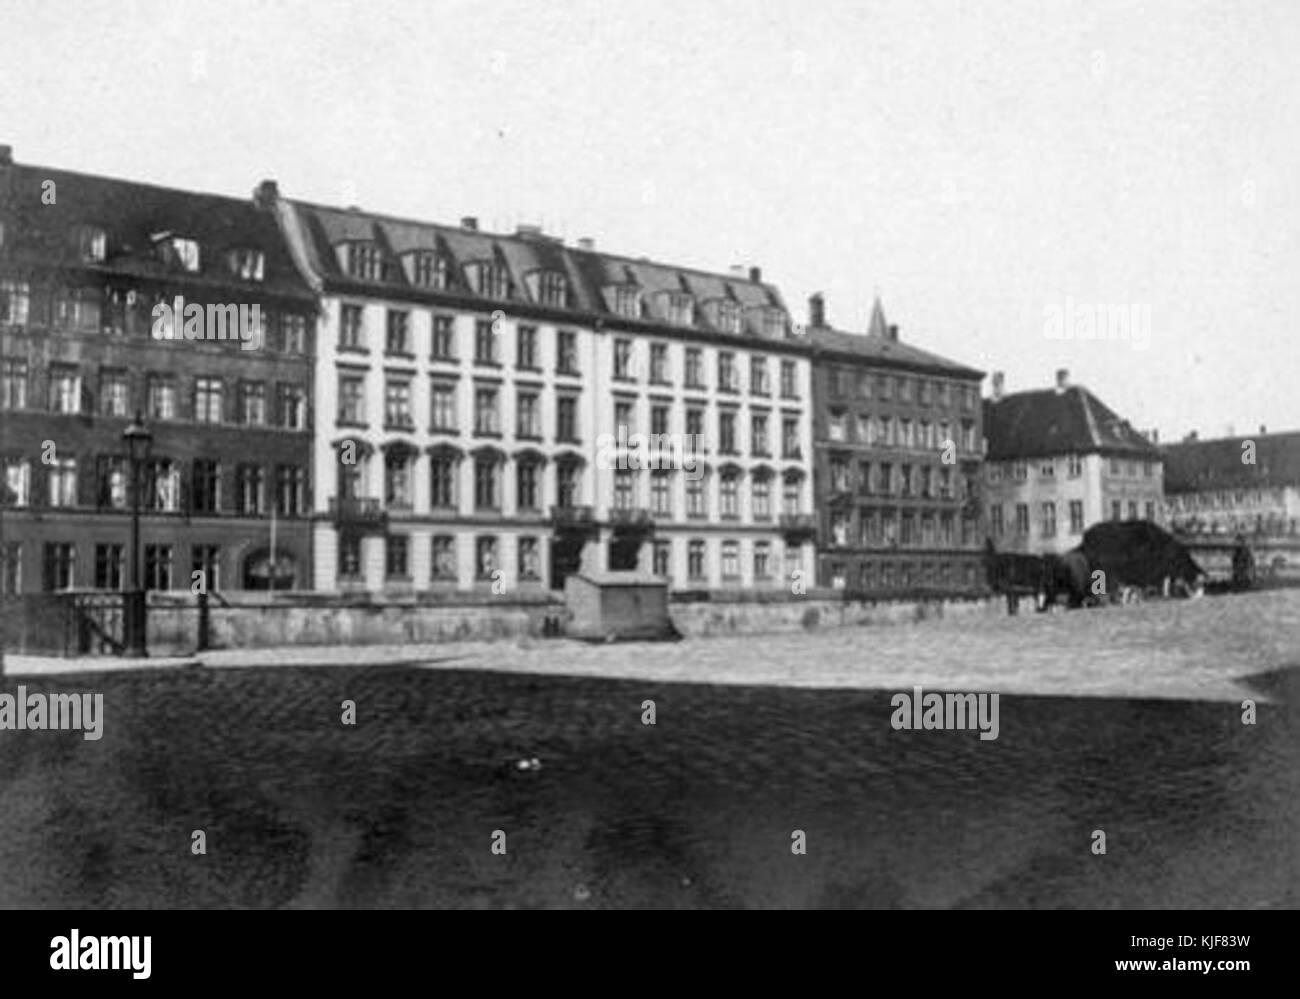 Frederiksholms Kanal 16 18 vintage photo - Stock Image